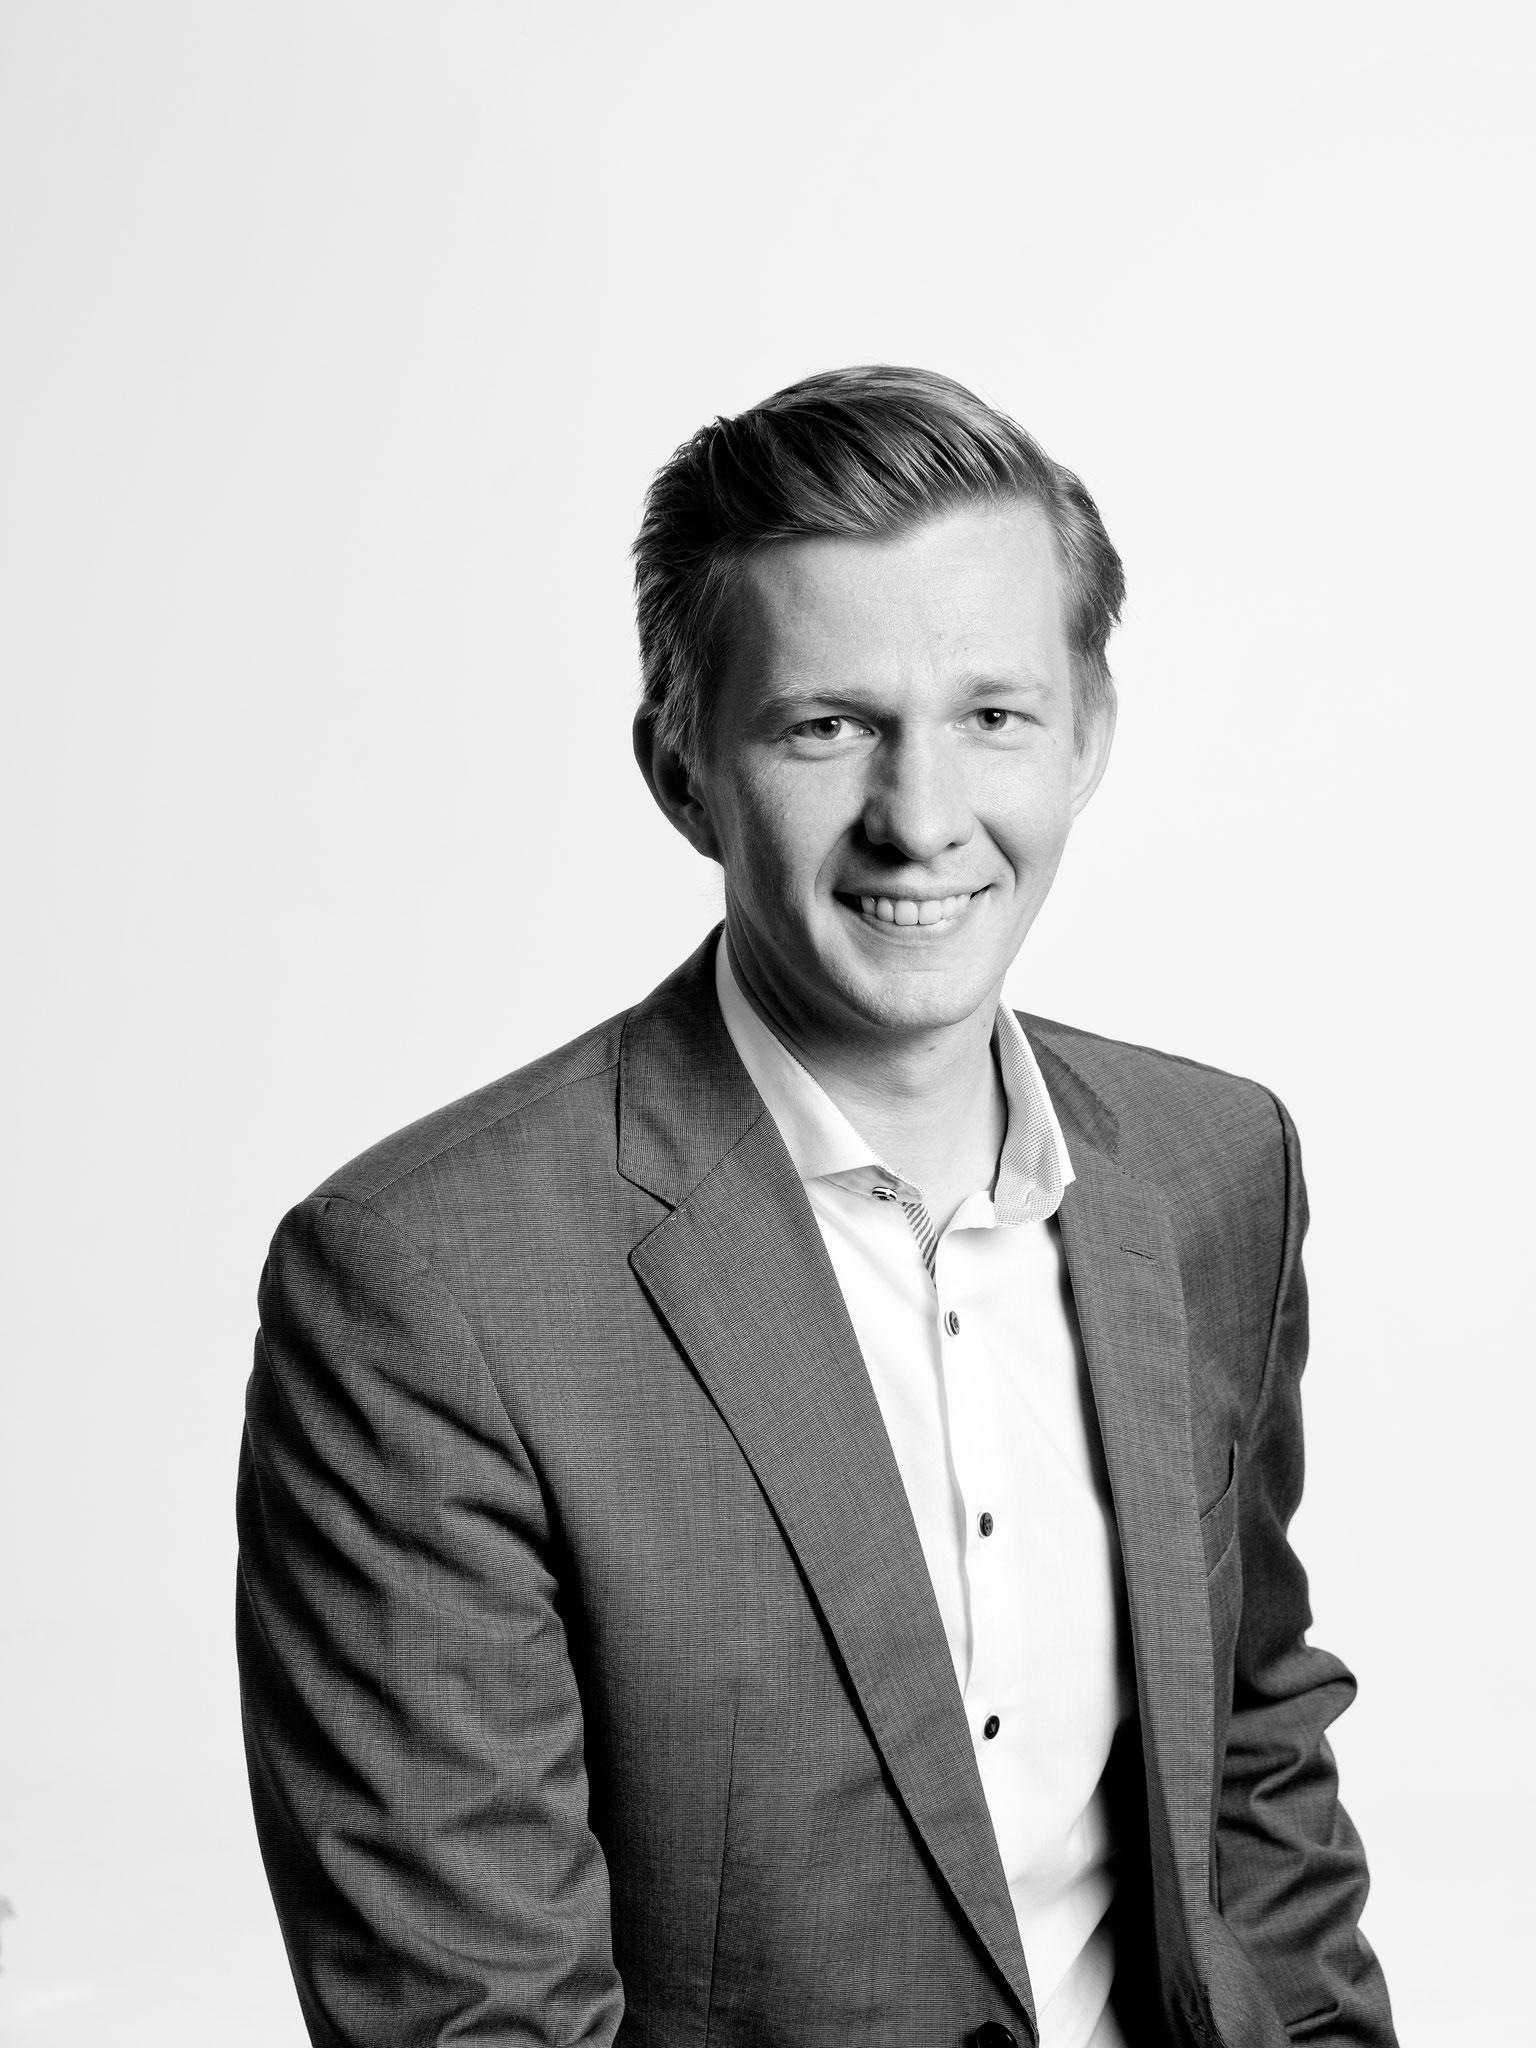 Matthias Seestern-Pauly